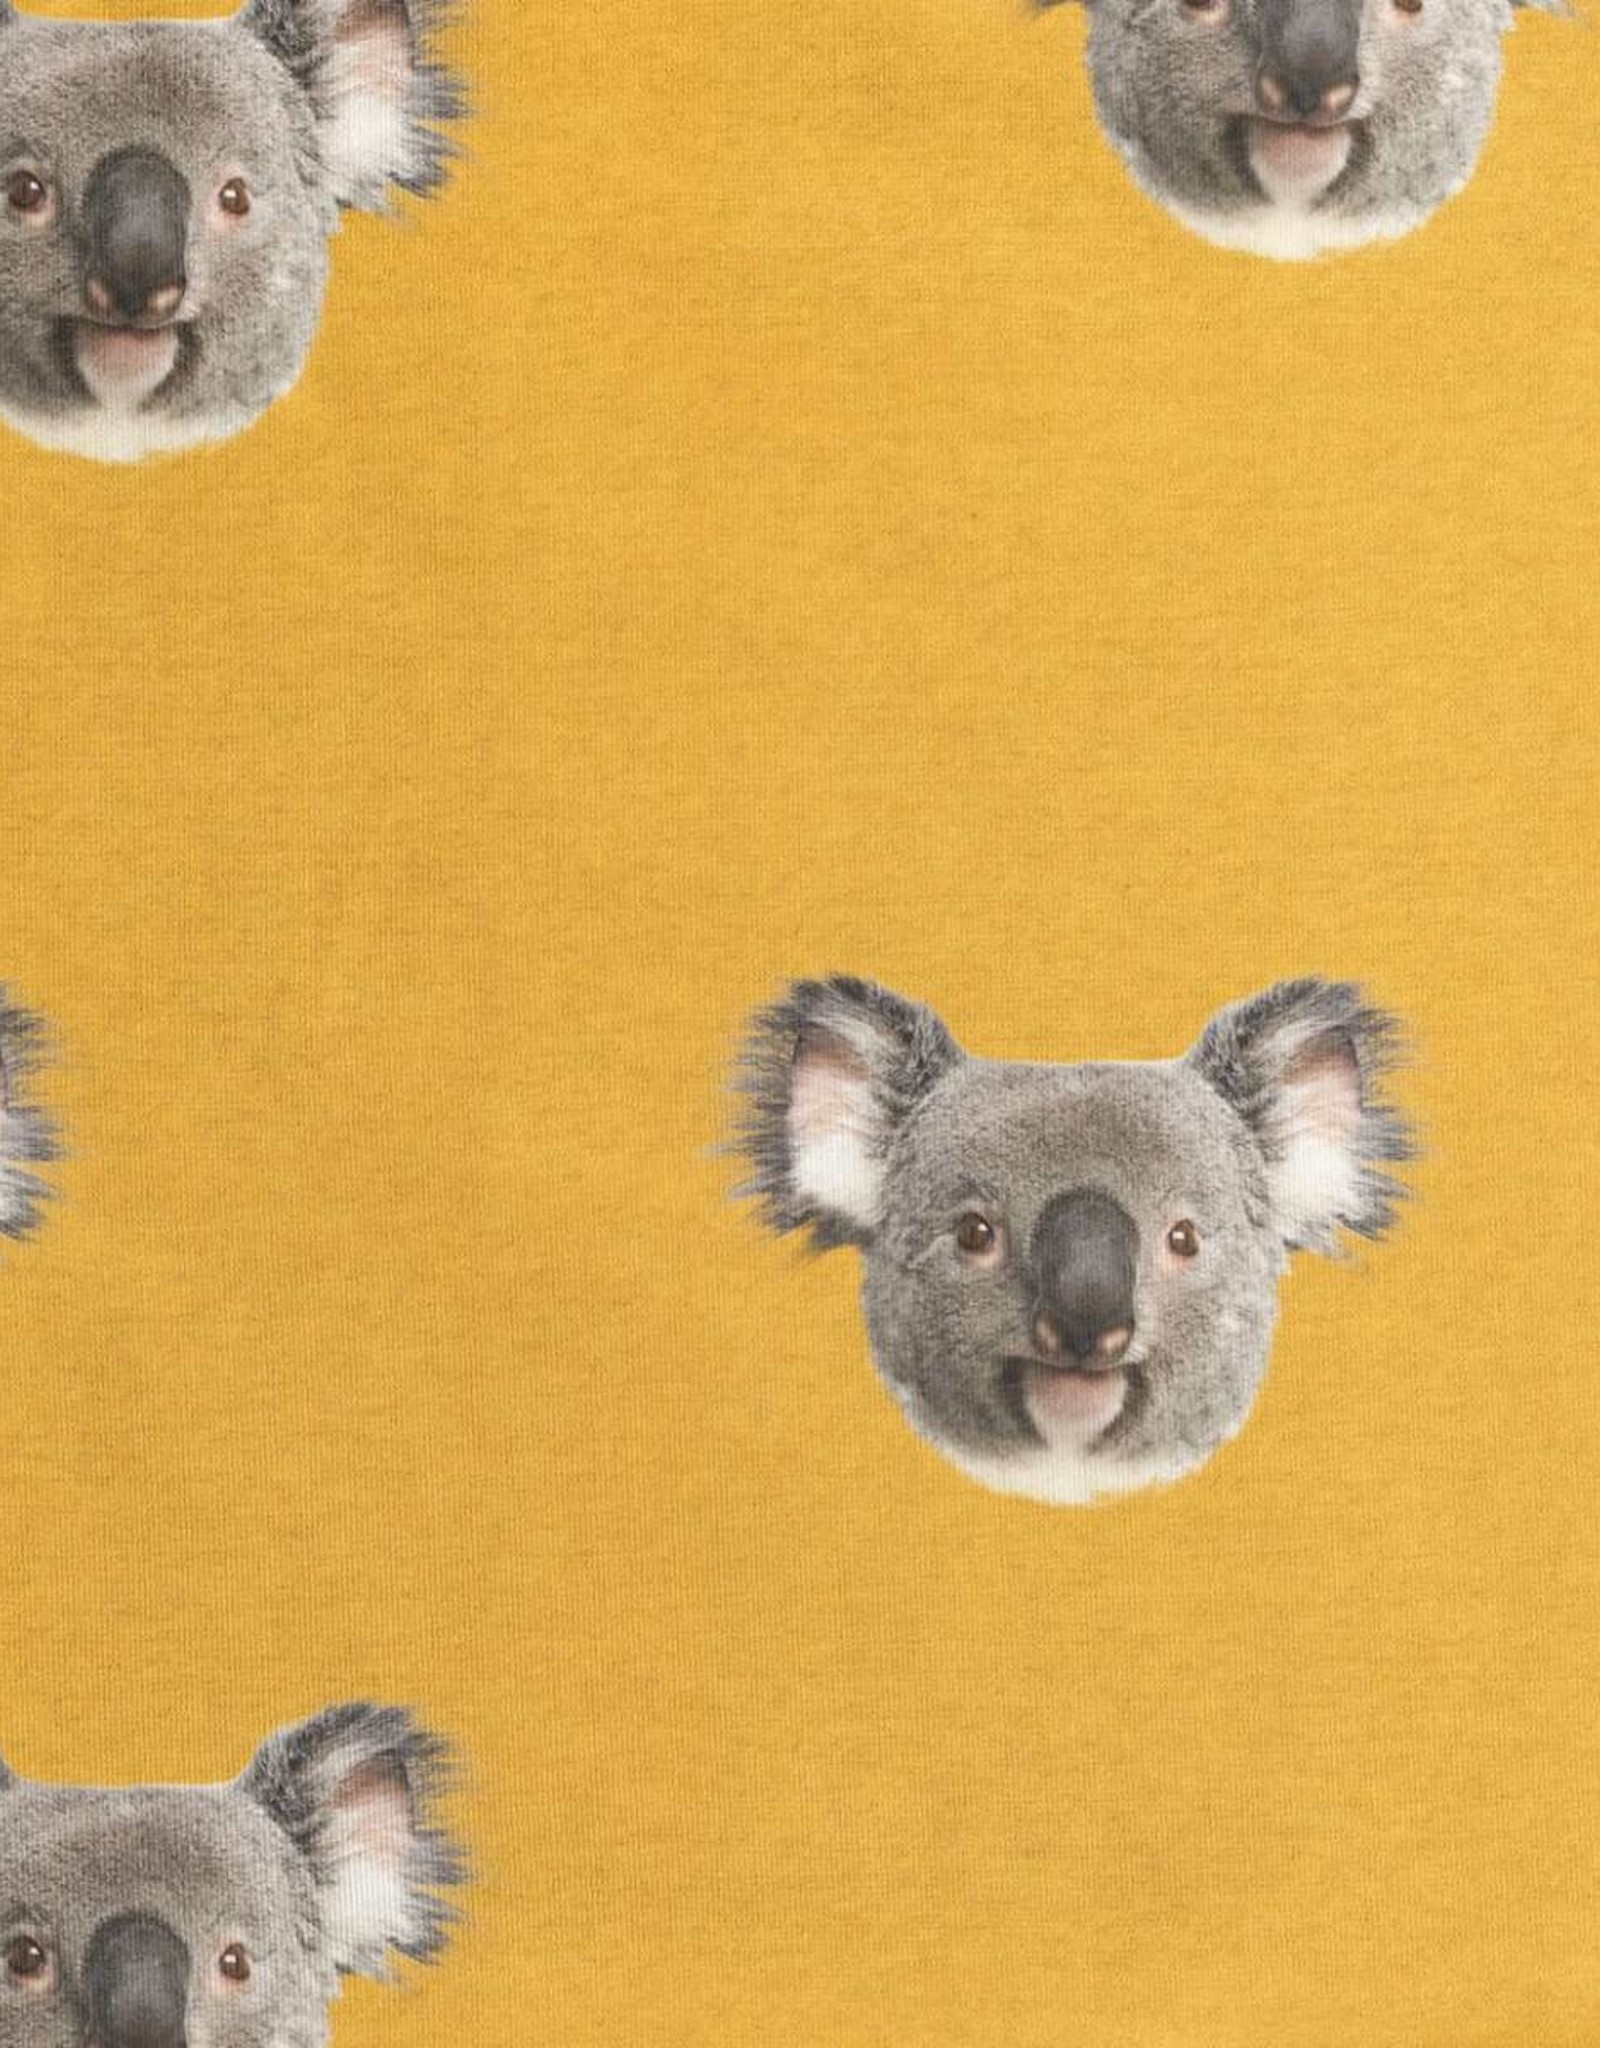 Snurk SNURK Koalas Sweater Kids